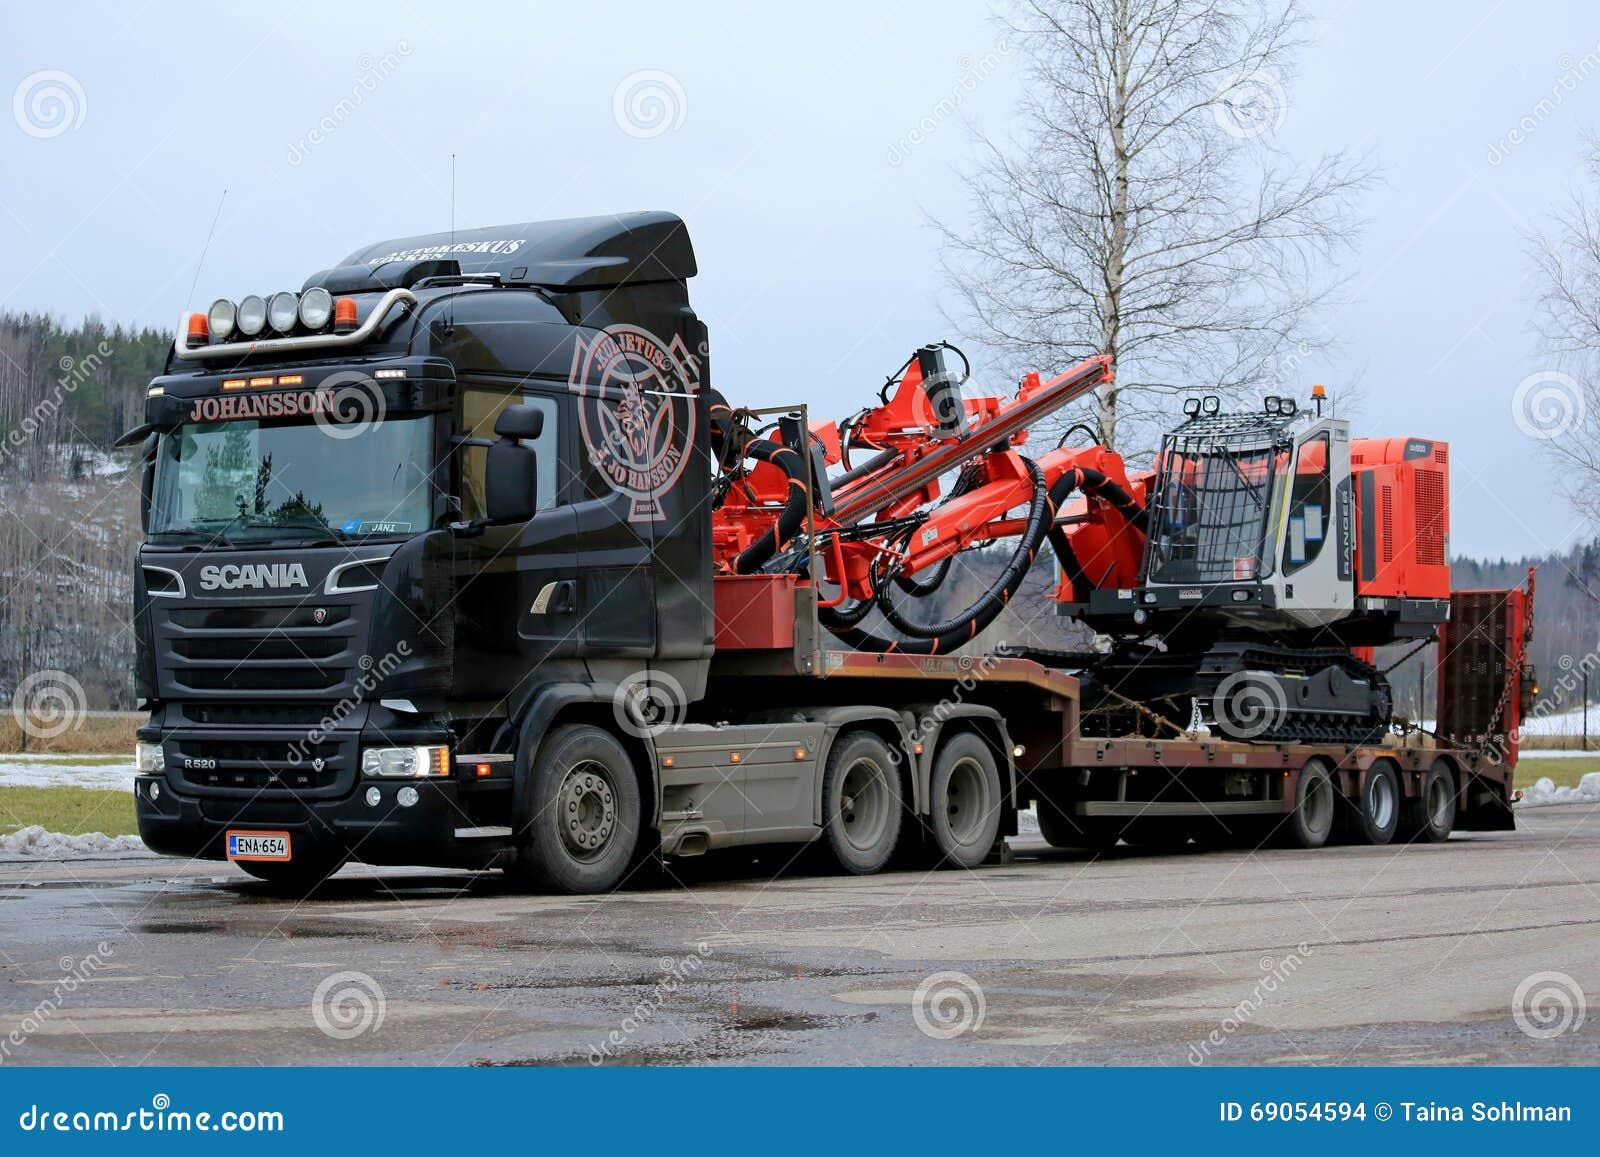 Scania Semi Hauls Sandvik Ranger Drill Rig Editorial Stock